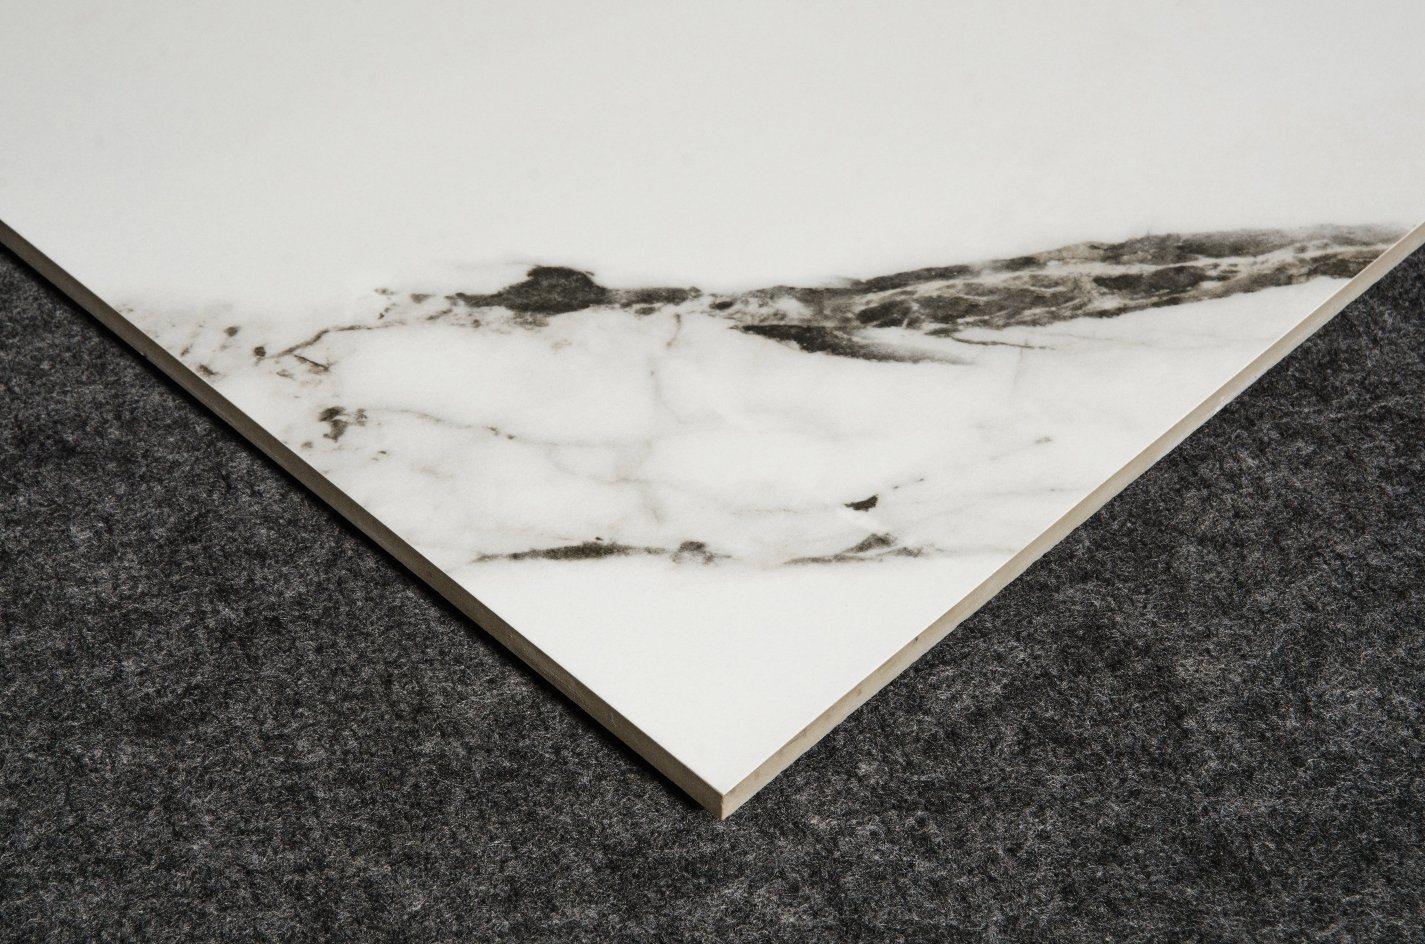 China Ceramic 600x600 Floor Tile Price In Foshan Kitchen Tiles